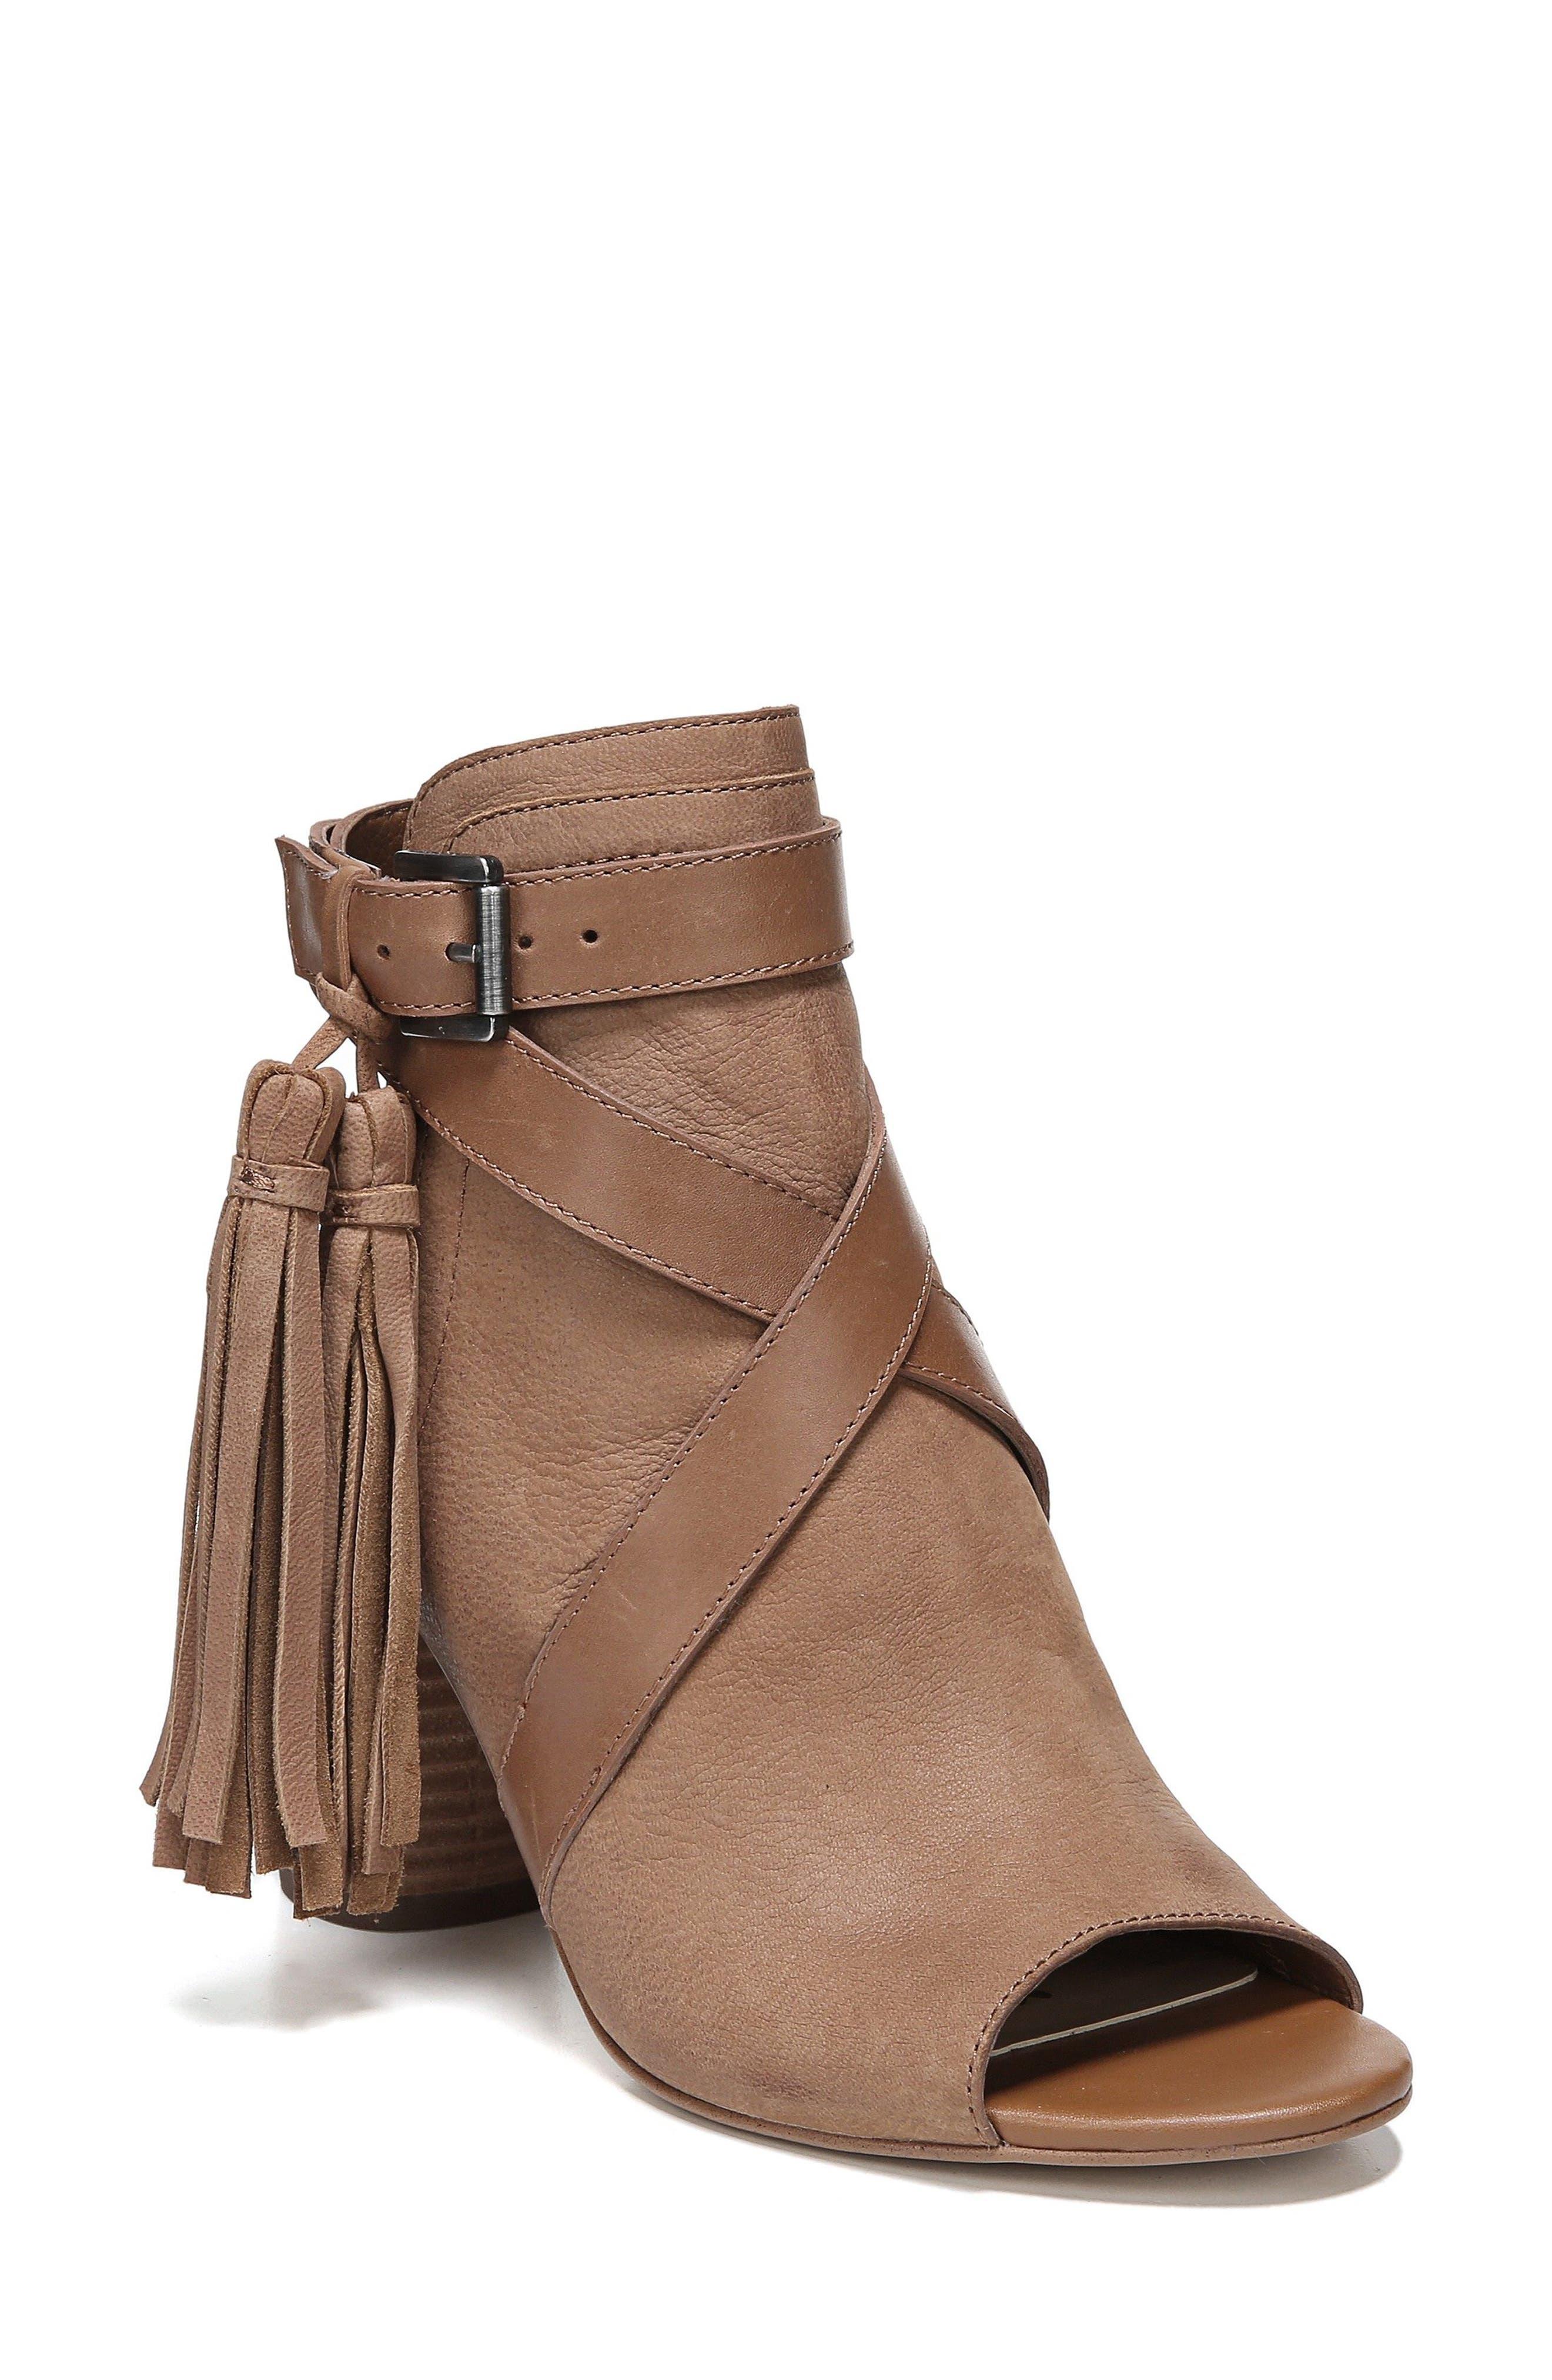 Vermont Block Heel Sandal,                         Main,                         color, Deep Saddle Nubuck Leather